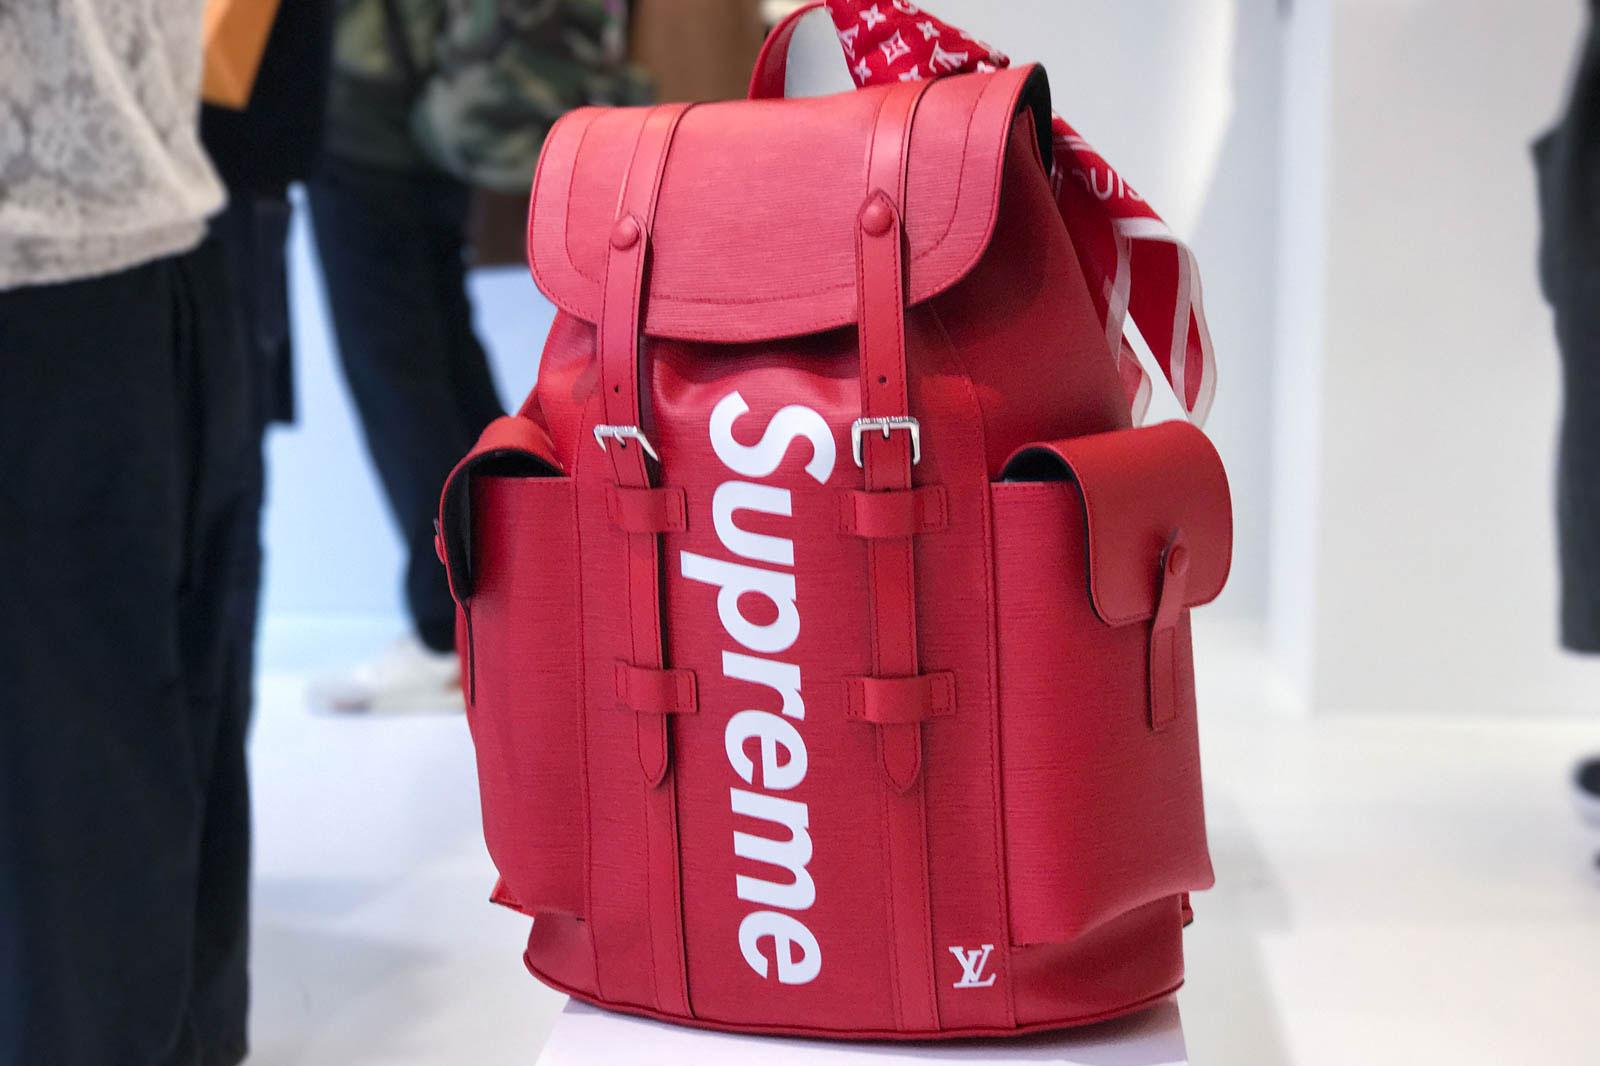 Supreme x Louis Vuitton 2017 Fall/Winter Closer Look Showroom - 3703564